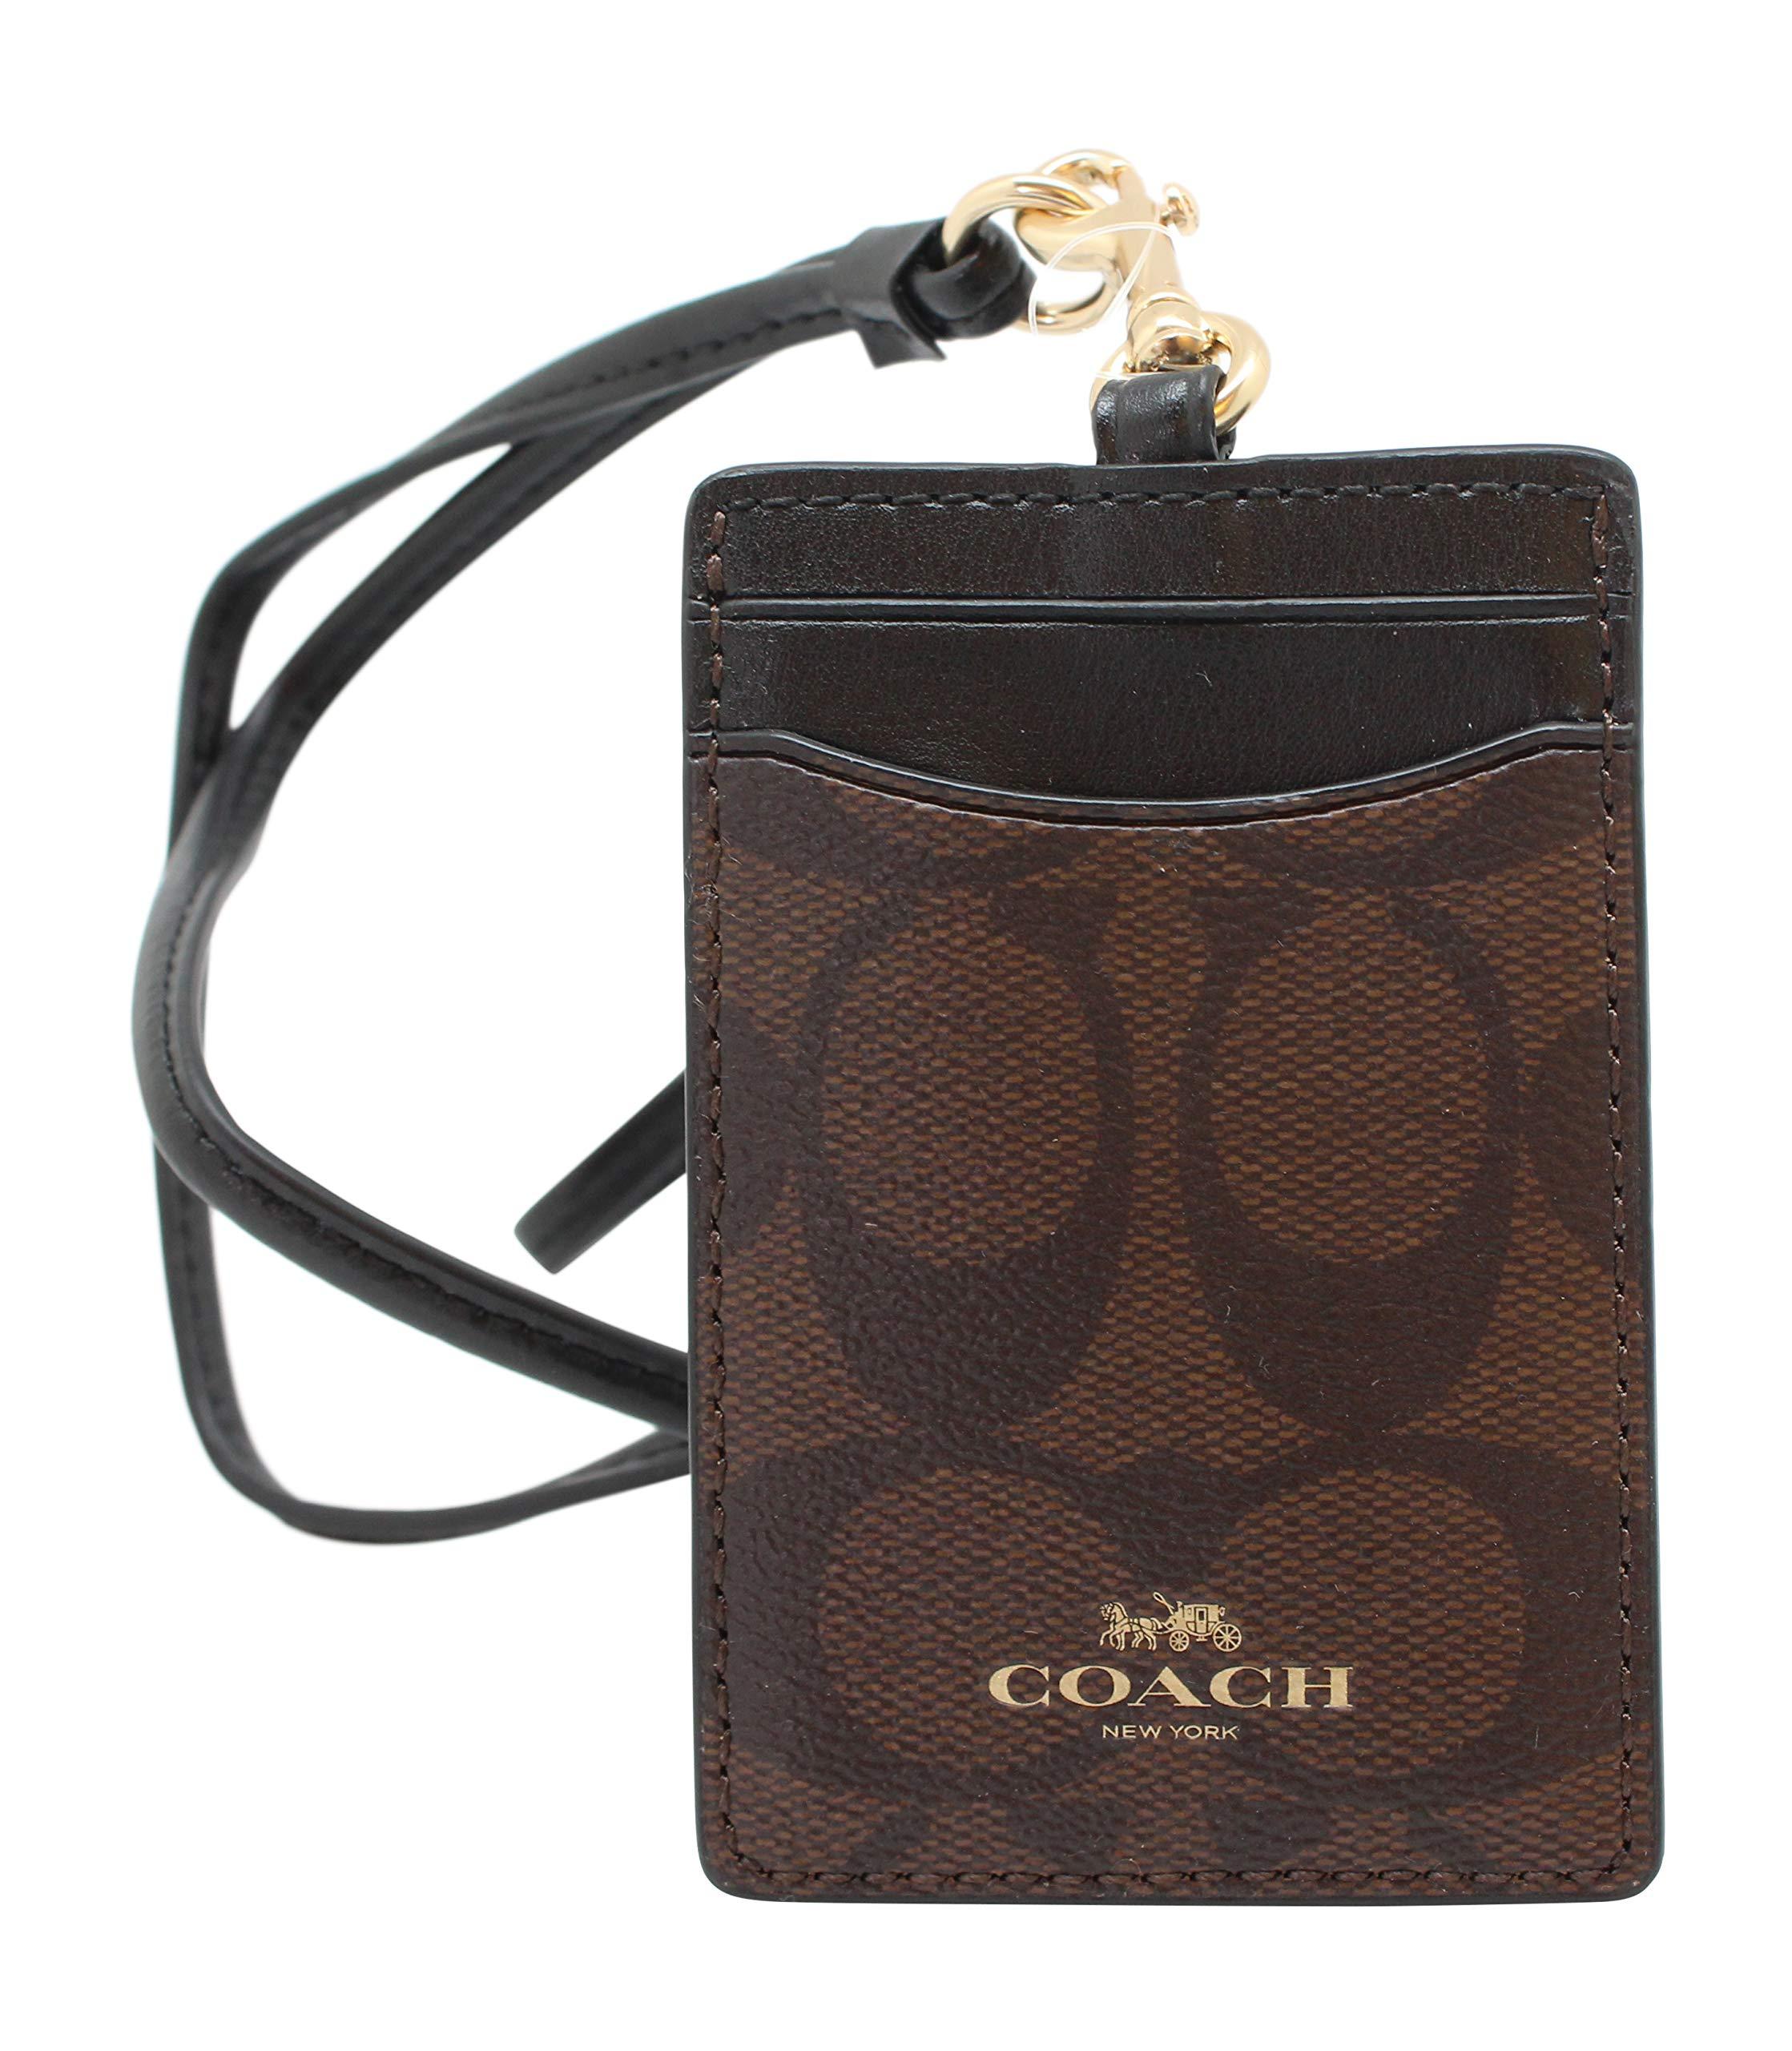 Coach Signature PVC Lanyard ID Badge Card Holder (Brown/Black) by Coach